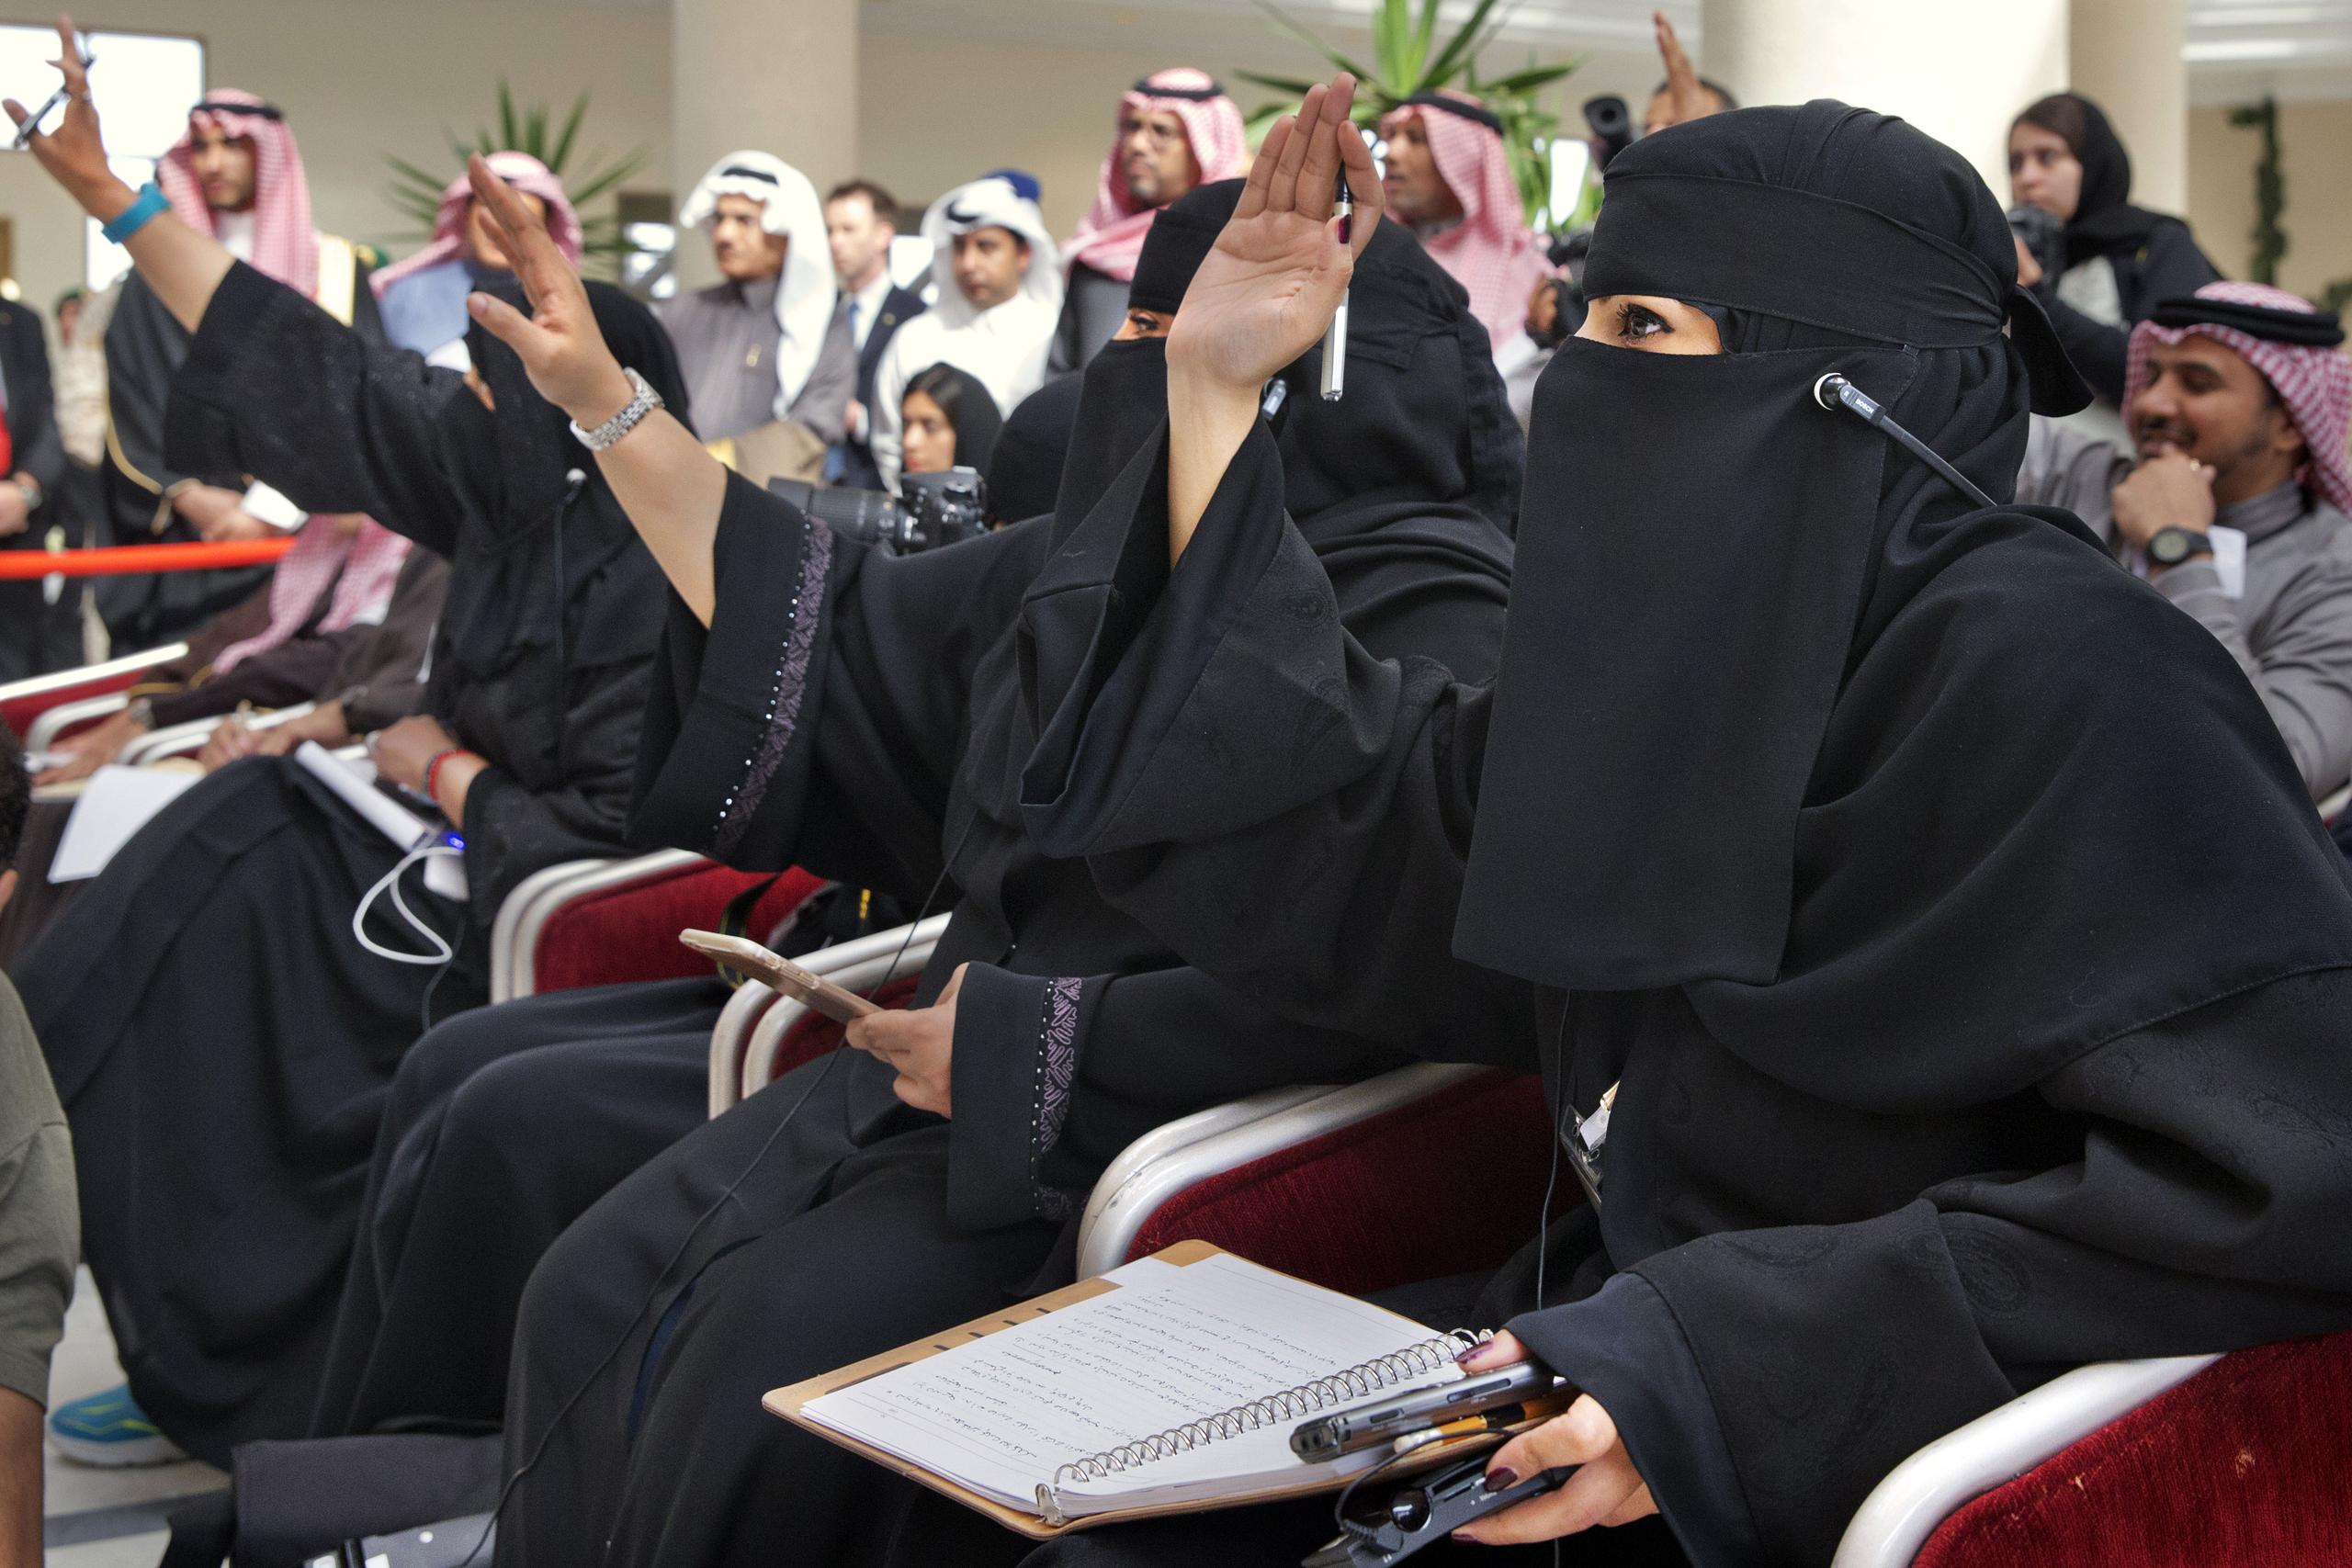 Saudi women journalists raise their hands to ask a question as U.S. Secretary of State John Kerry and Saudi Foreign Minister Adel al-Jubeir speak to members of the media at King Salman Regional Air Base in Riyadh, Saudi Arabia on Jan. 23, 2016.